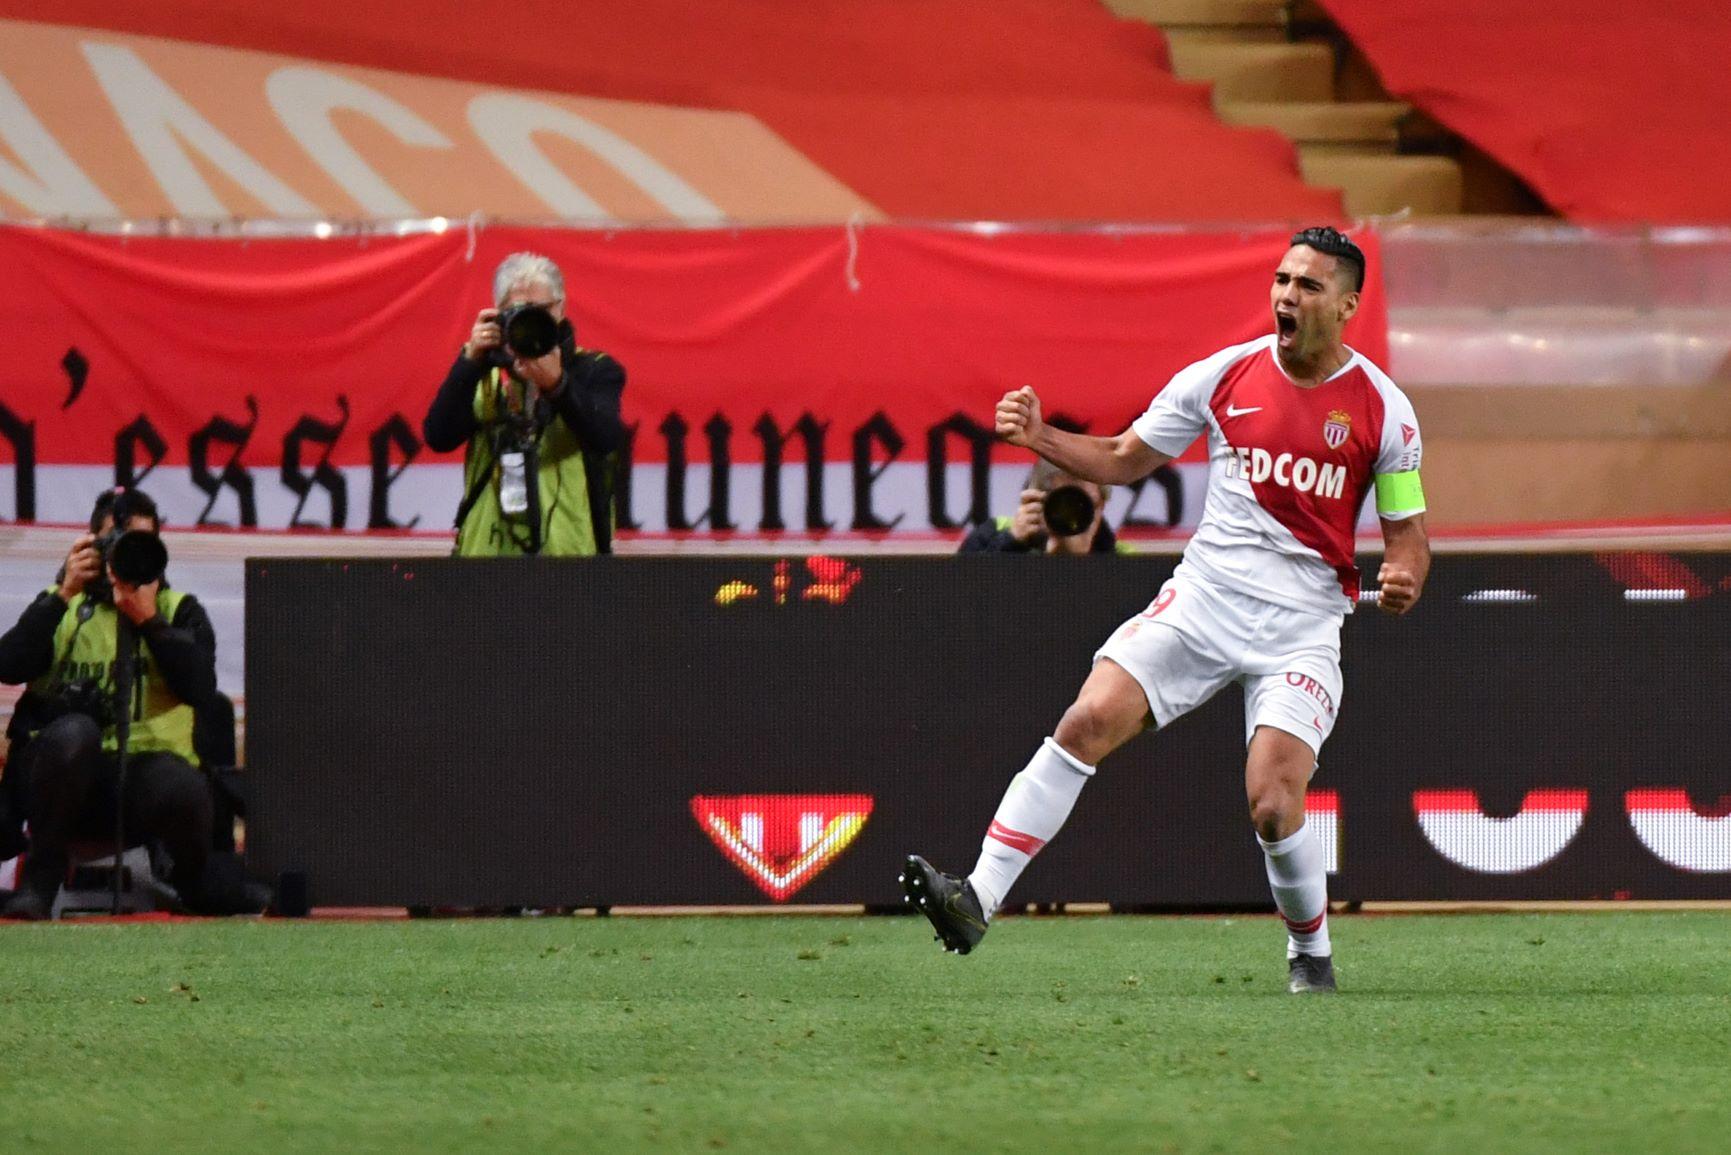 (Video) Con gol de Falcao, el Mónaco quedó prácticamente a salvo del descenso en Francia